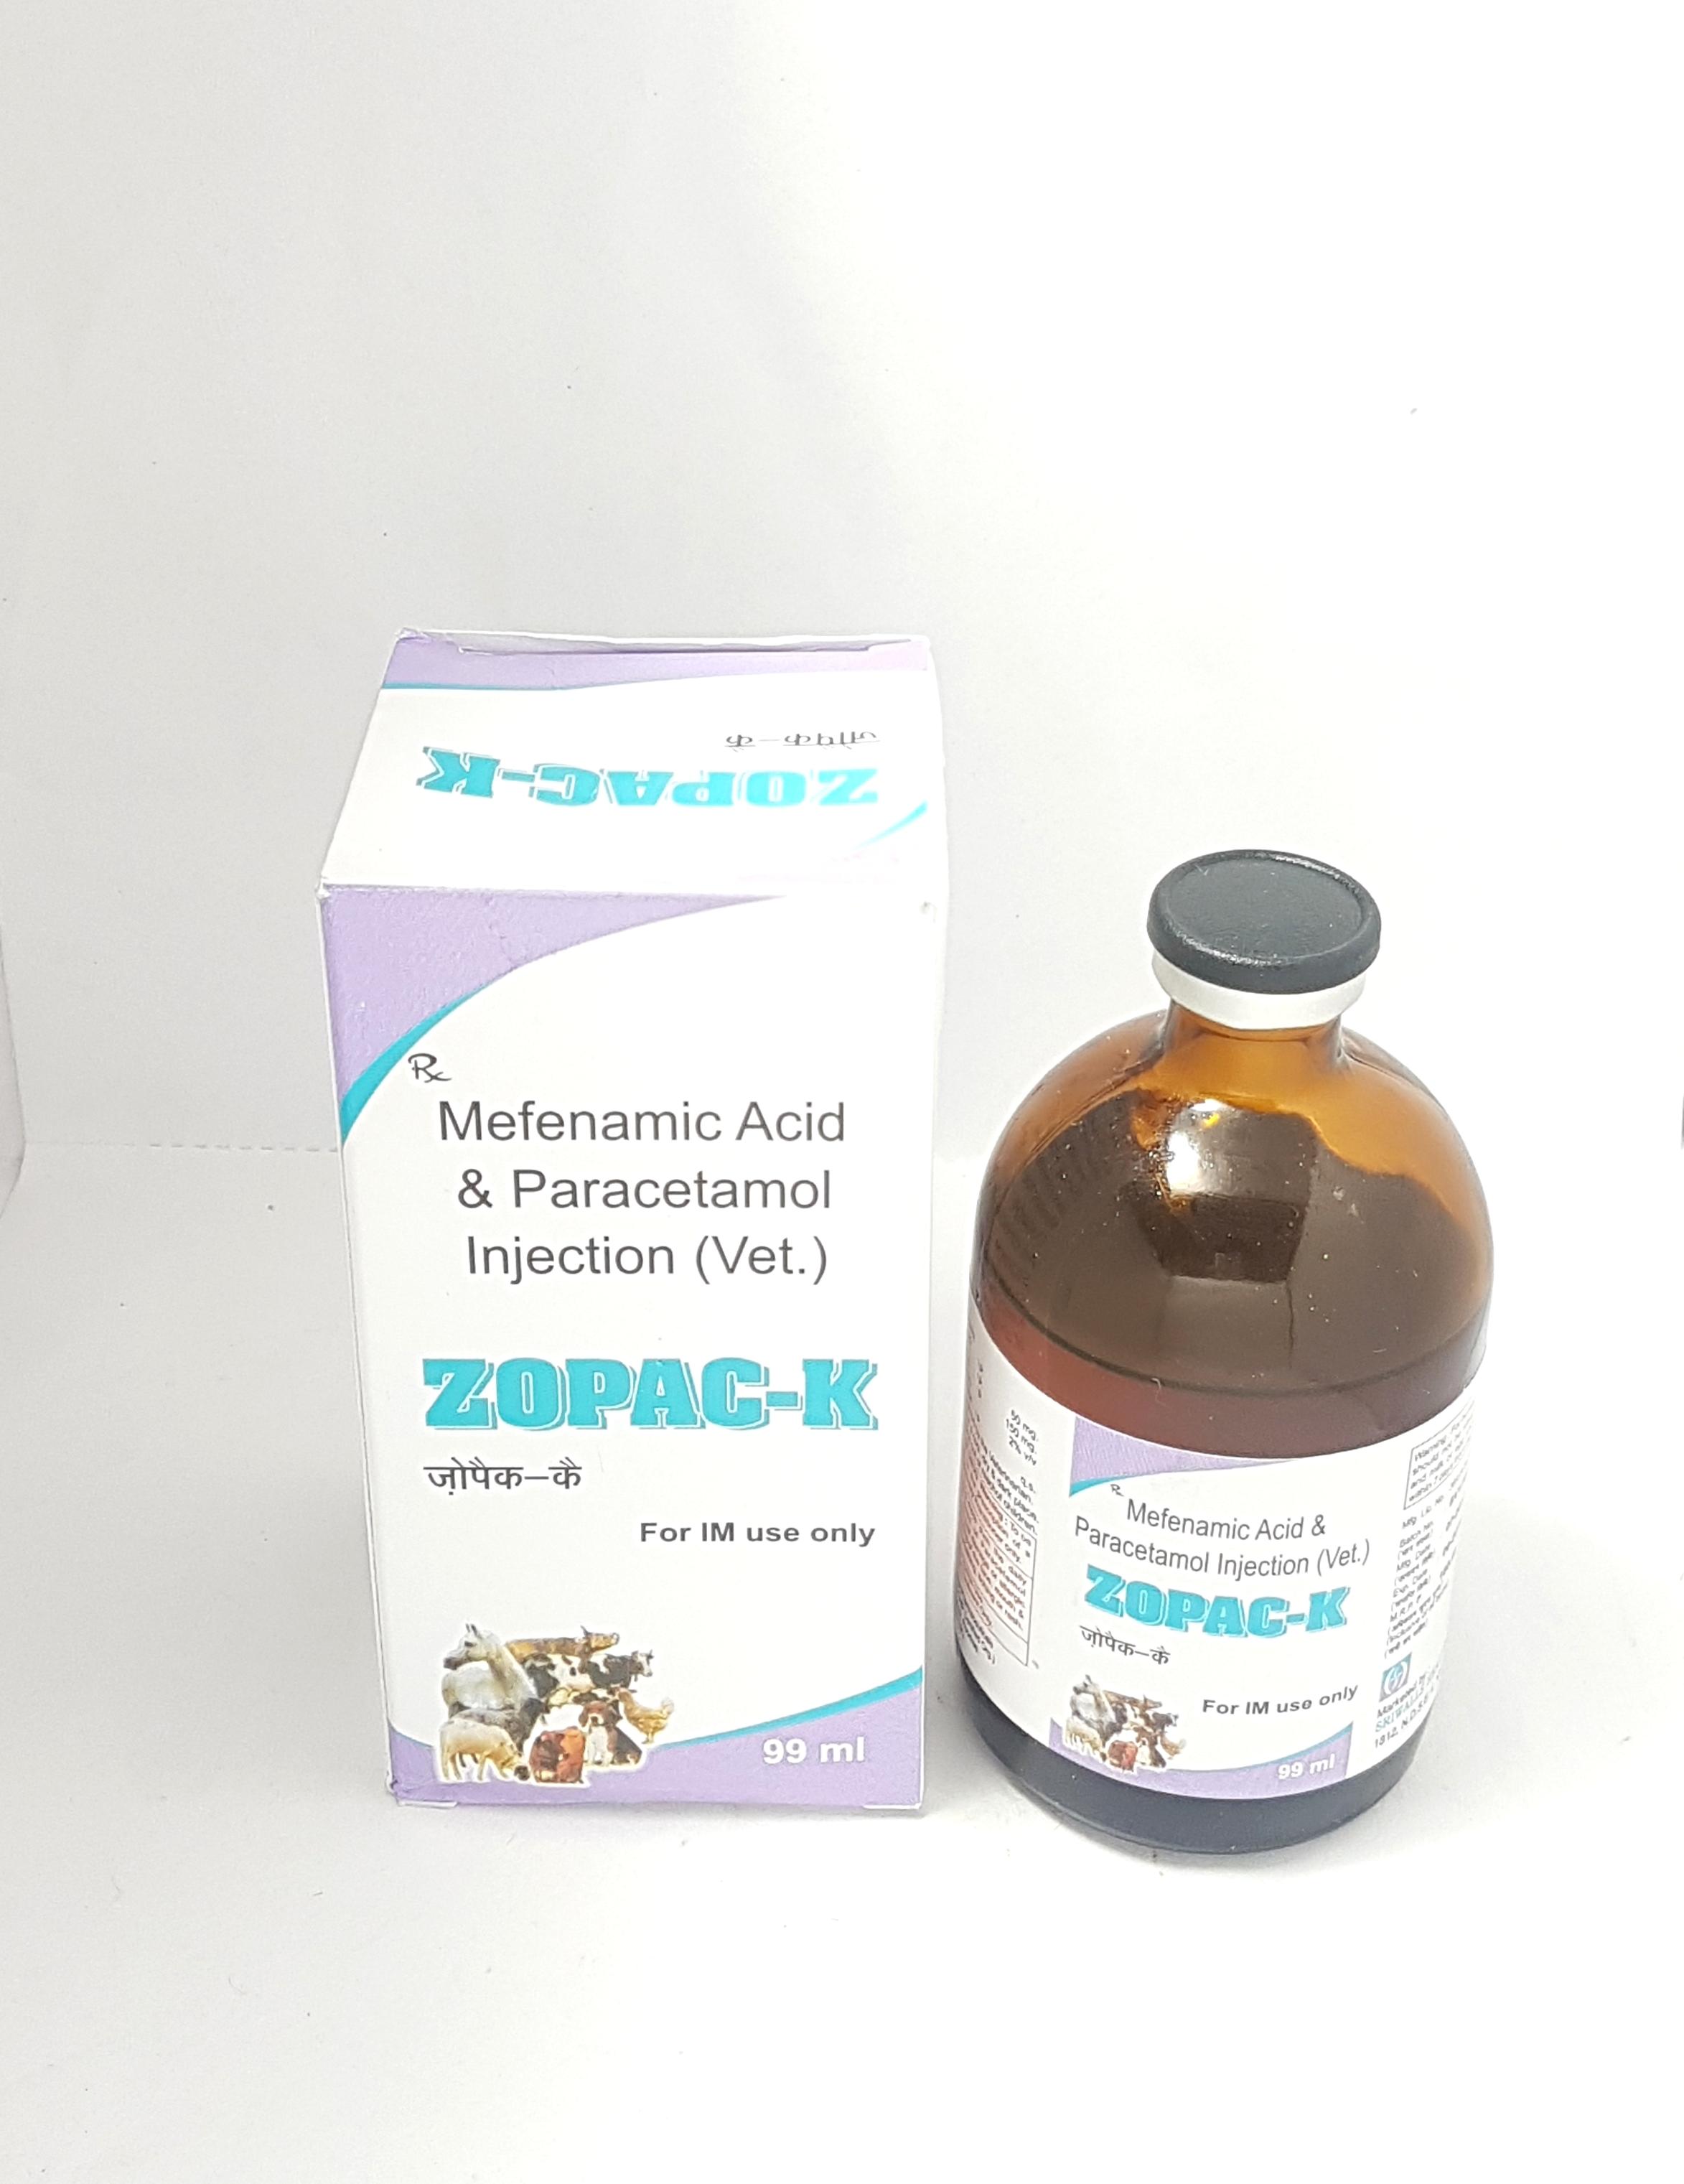 Mefenamic Acid & Paracetamol 99 mL Injection